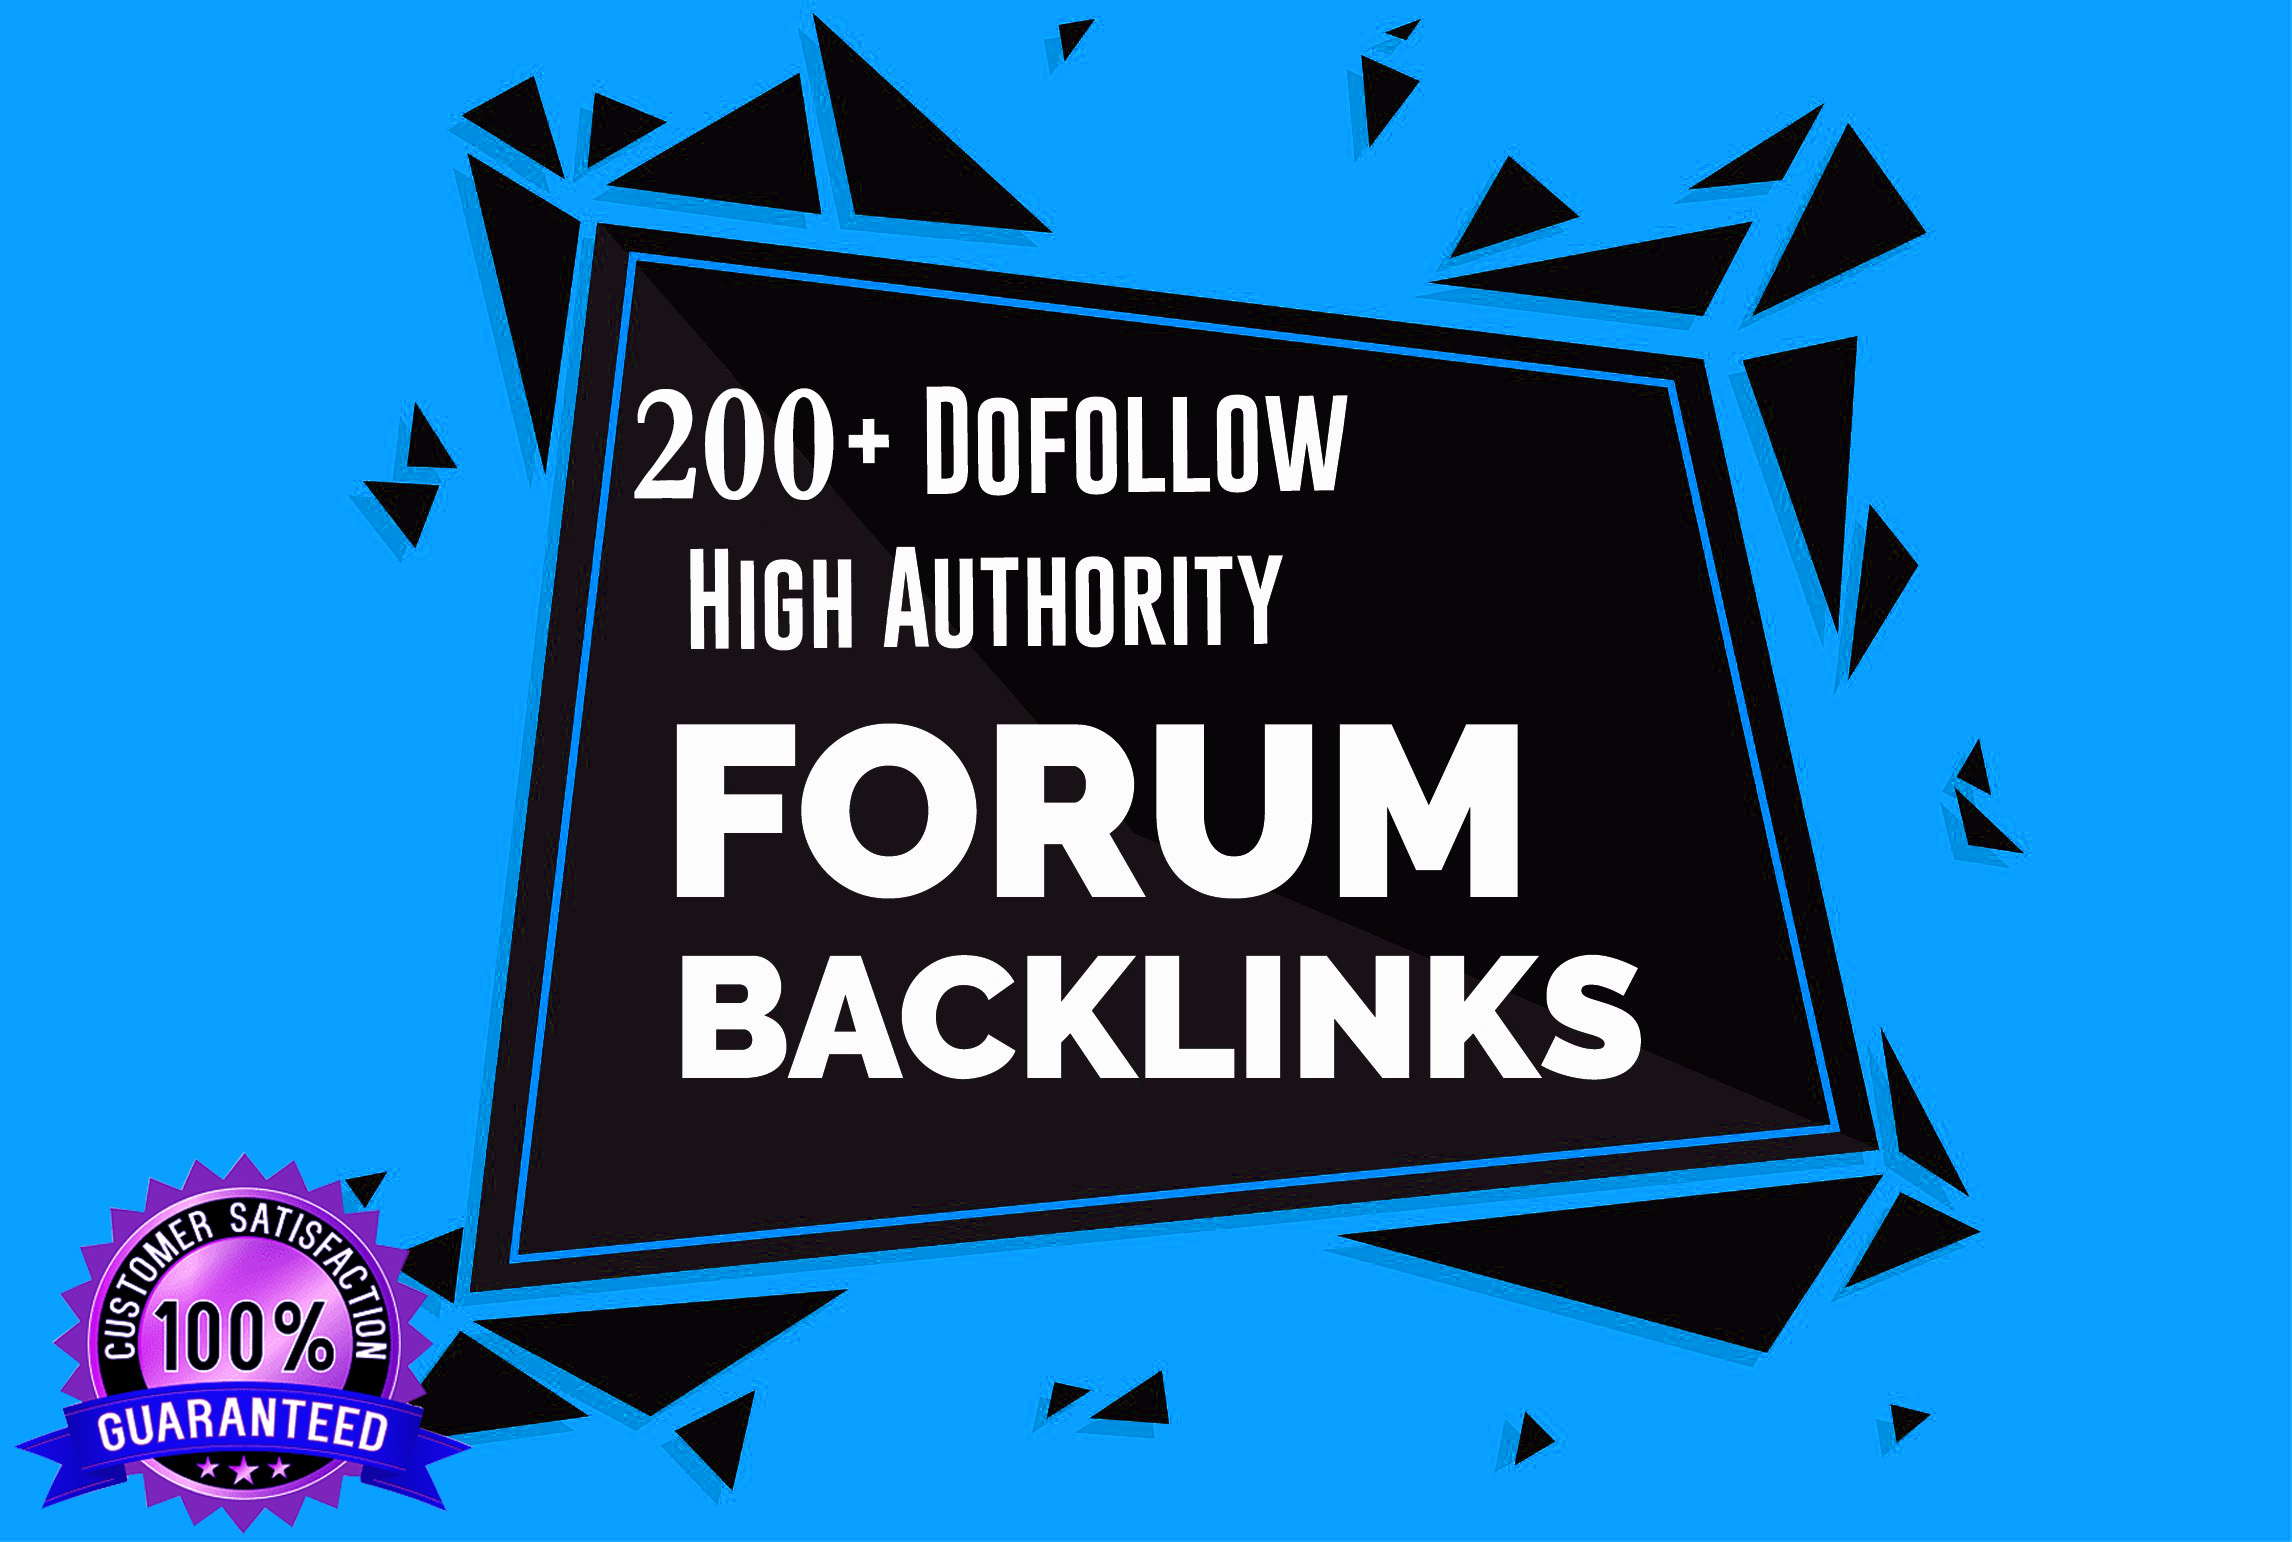 200+Dofollow high authority forum backlinks